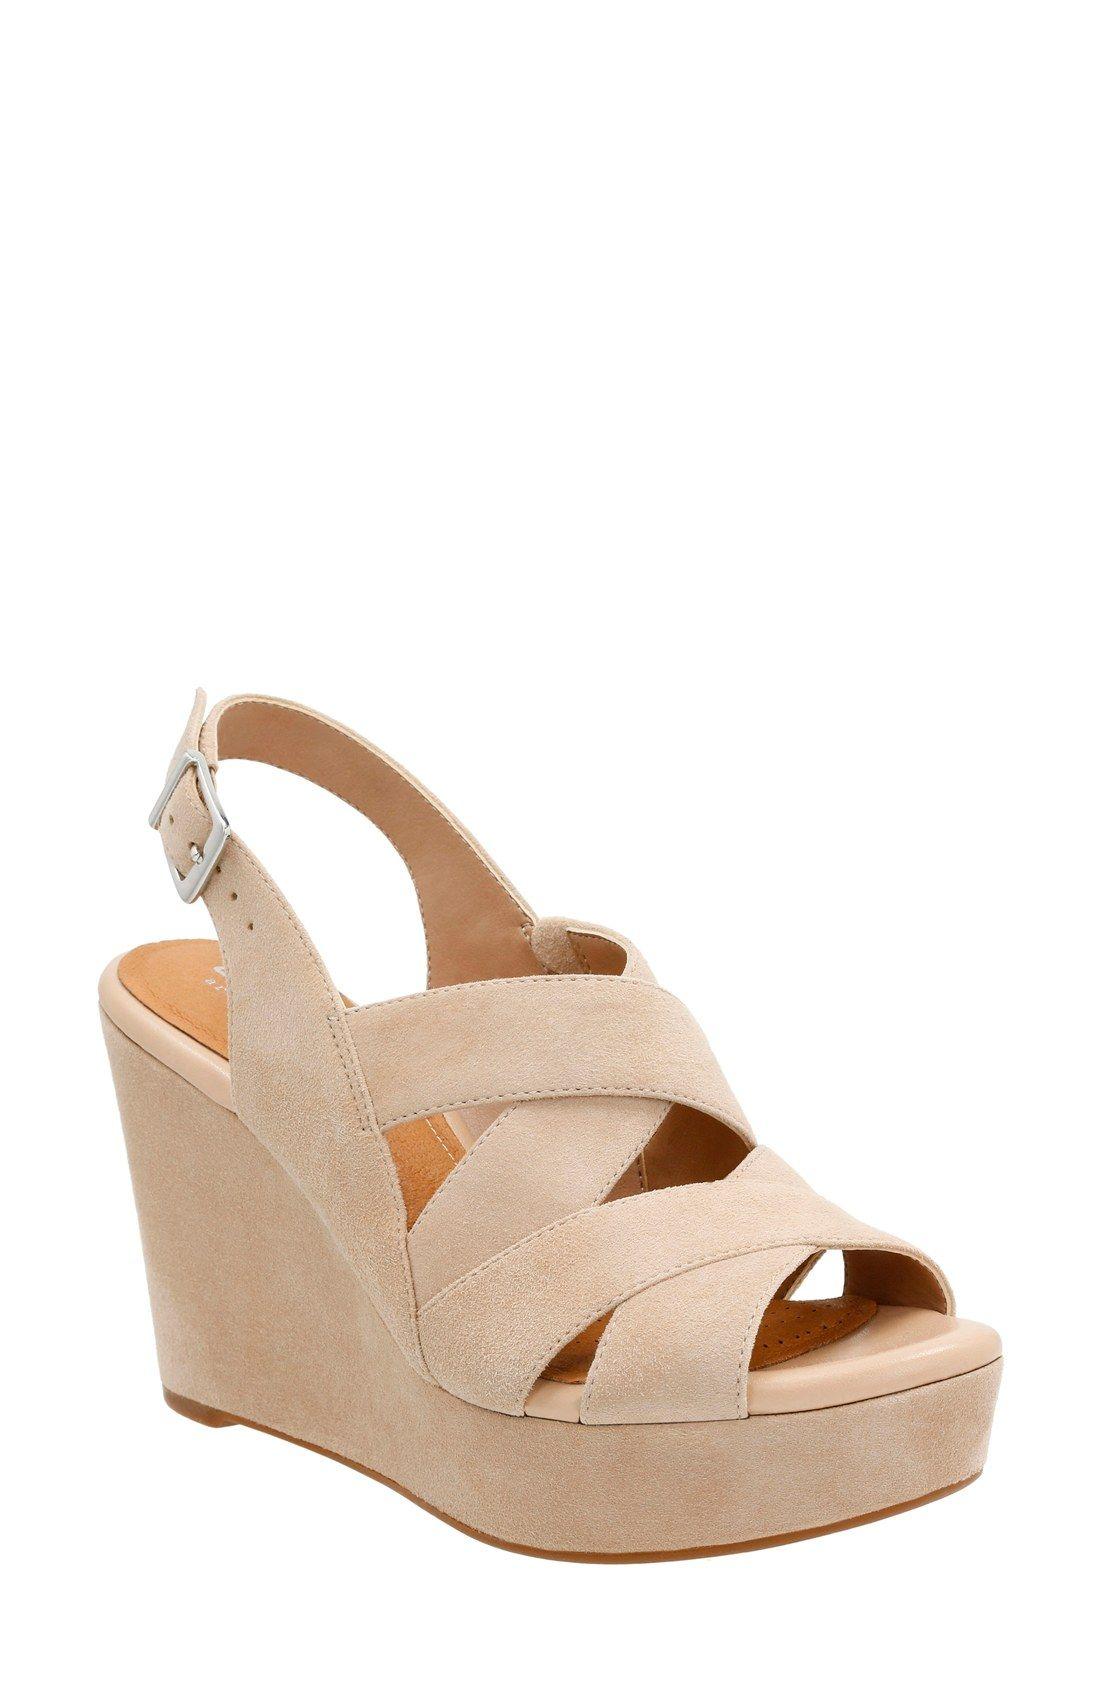 db2a5afbf94d Clarks®  Amelia Alice  Slingback Wedge Sandal (Women)